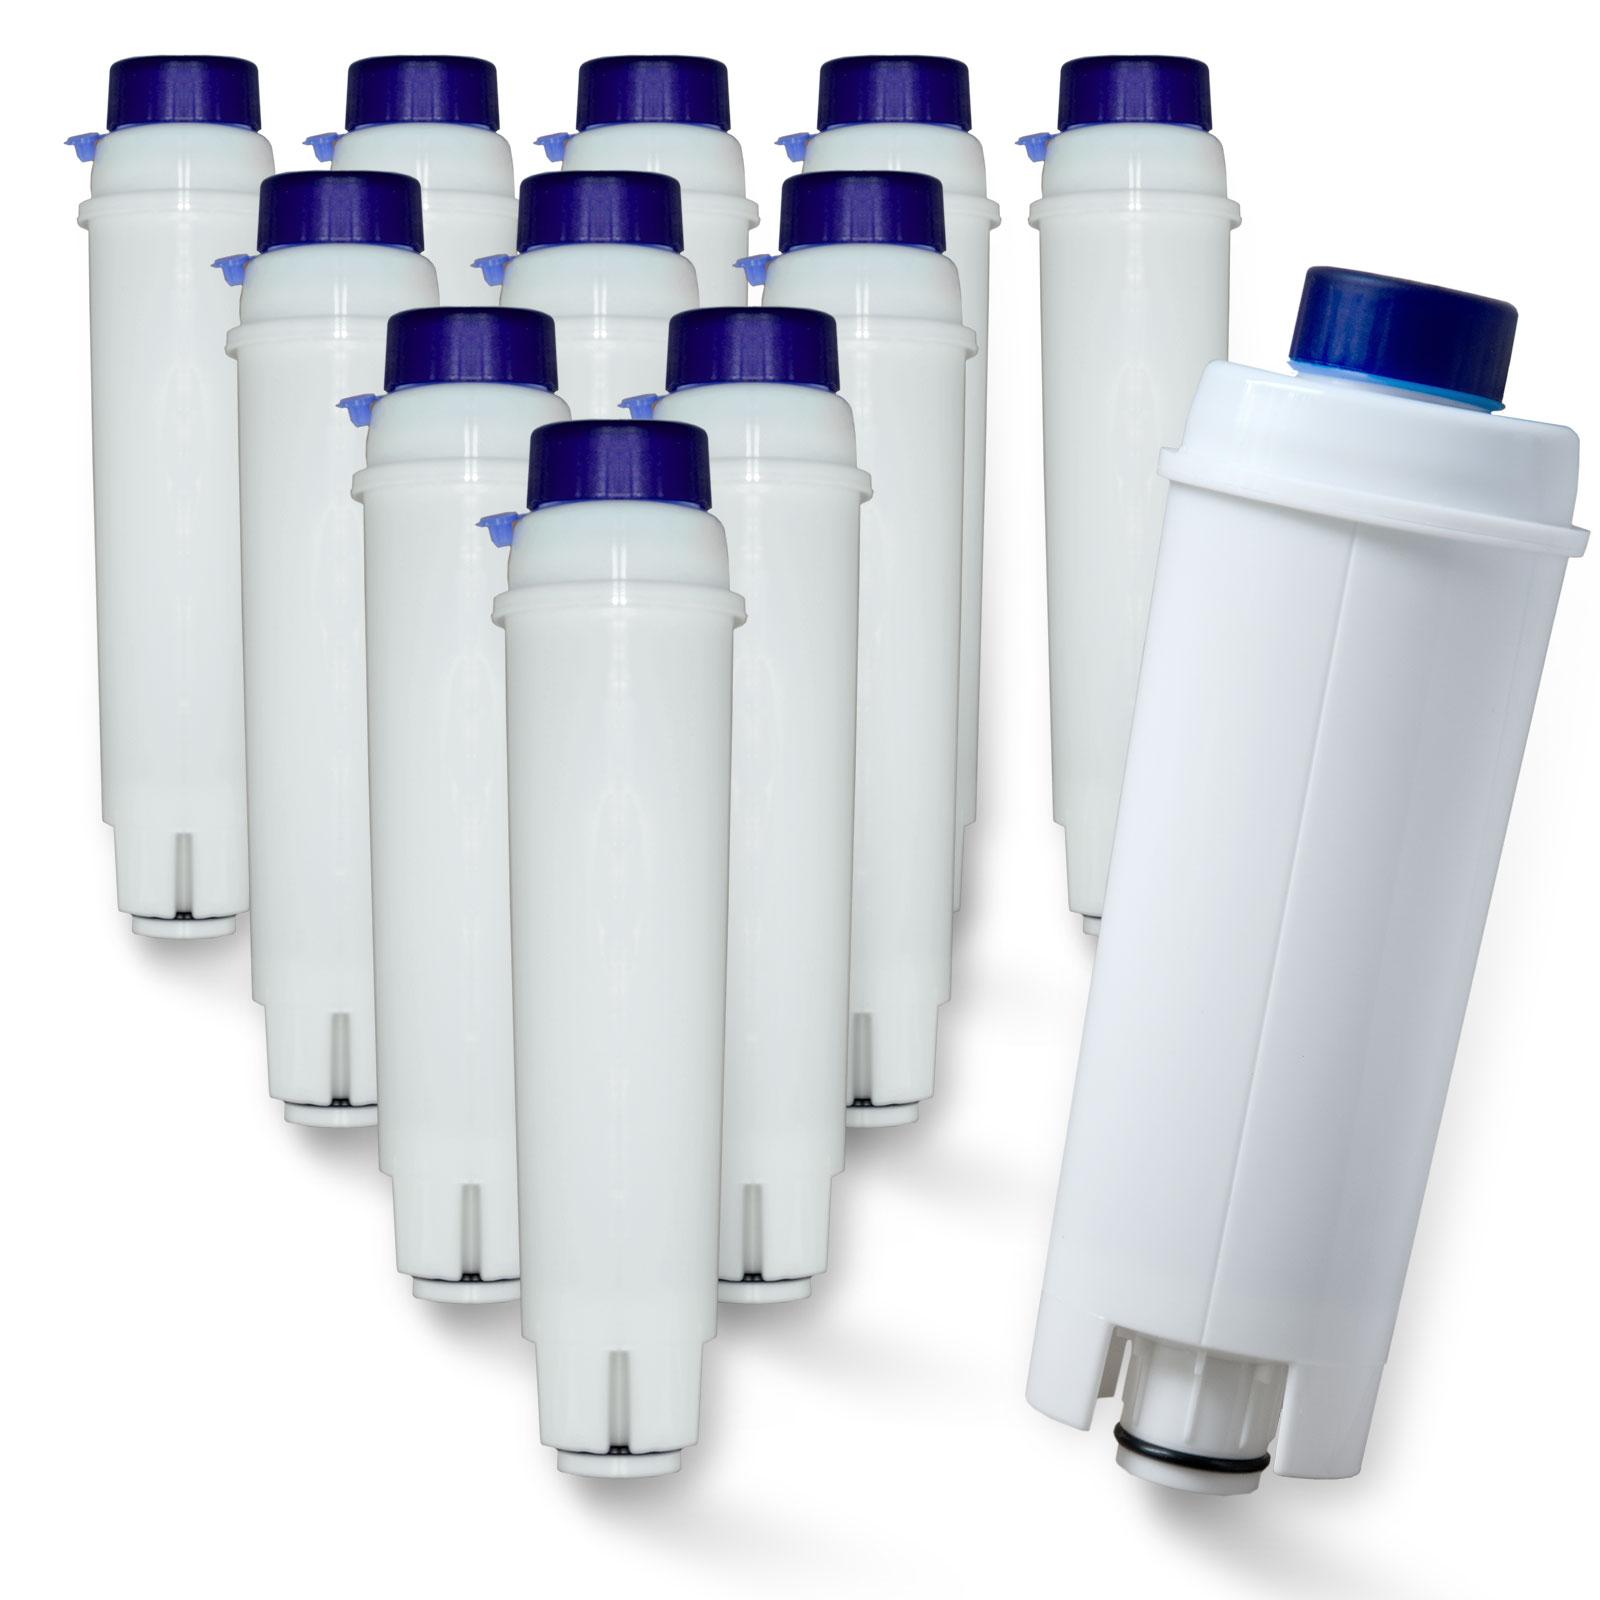 12 x Filterpatrone AQK-11 kompatibel für deLonghi SER3017 DLS C002 5513292811